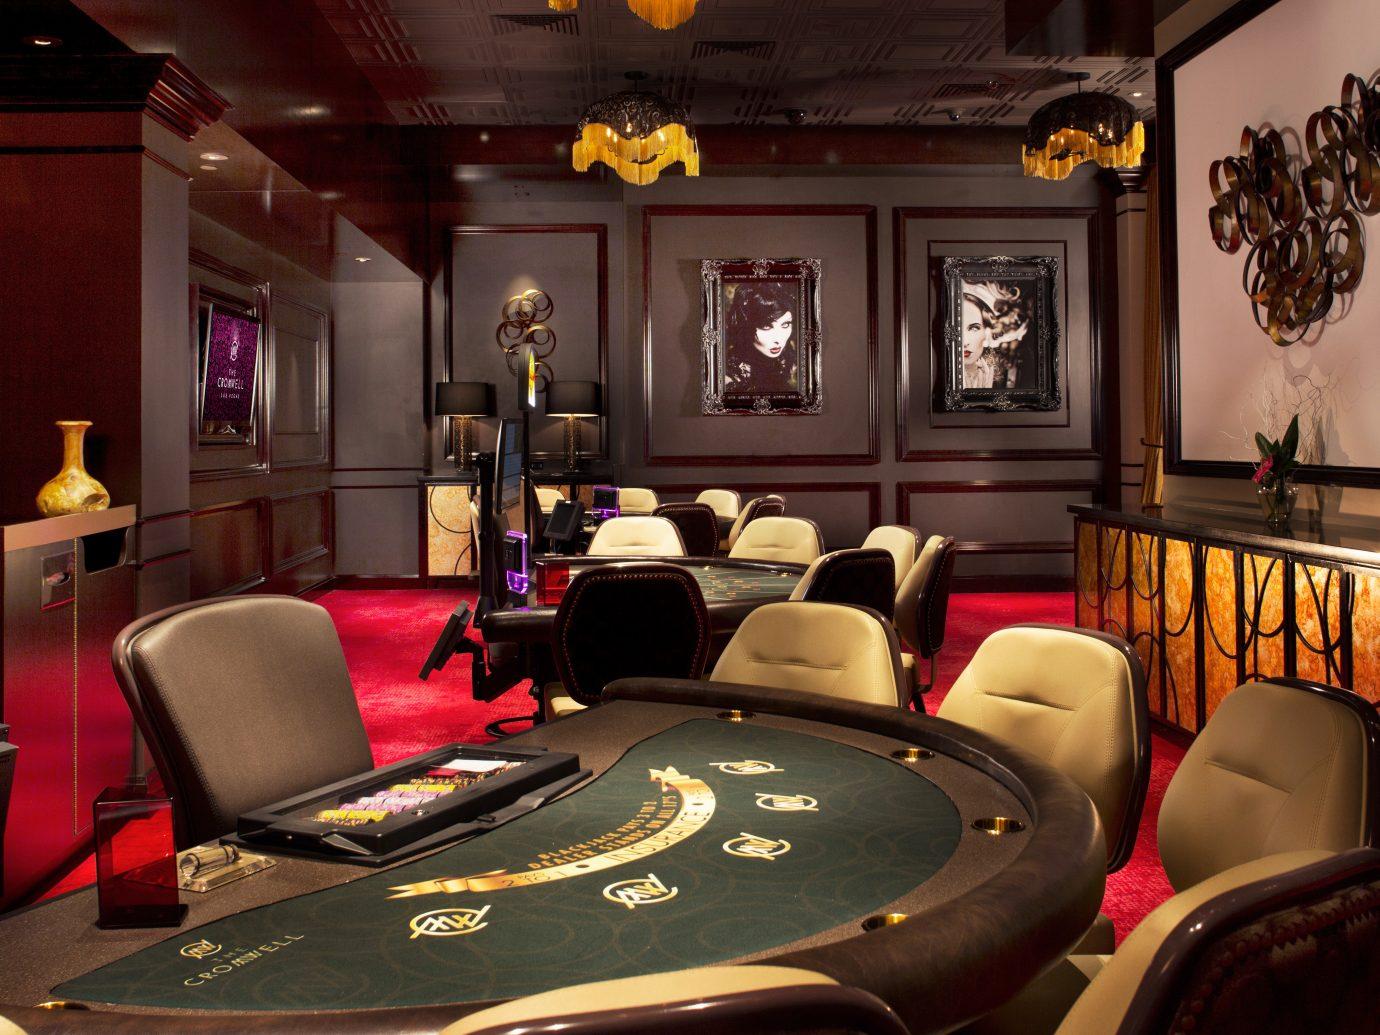 Hotels Lounge Luxury Modern indoor recreation room ceiling room billiard room interior design living room leather